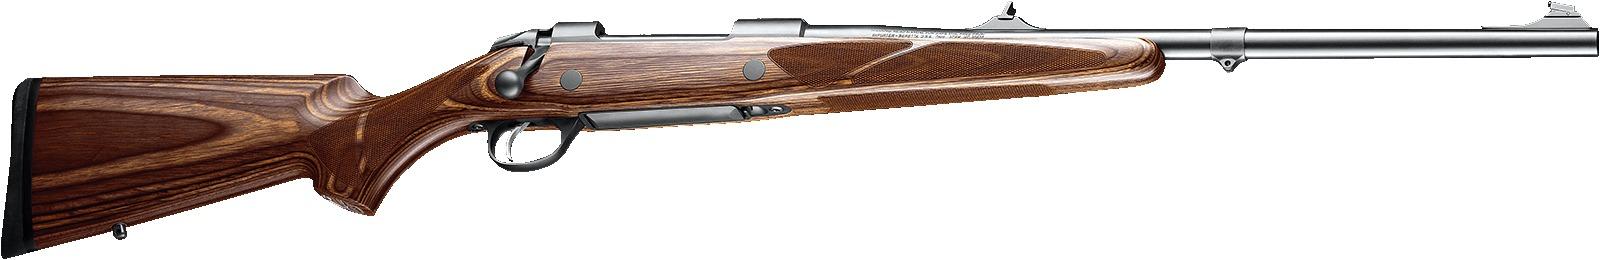 Sako model85 Brown Bear rifle